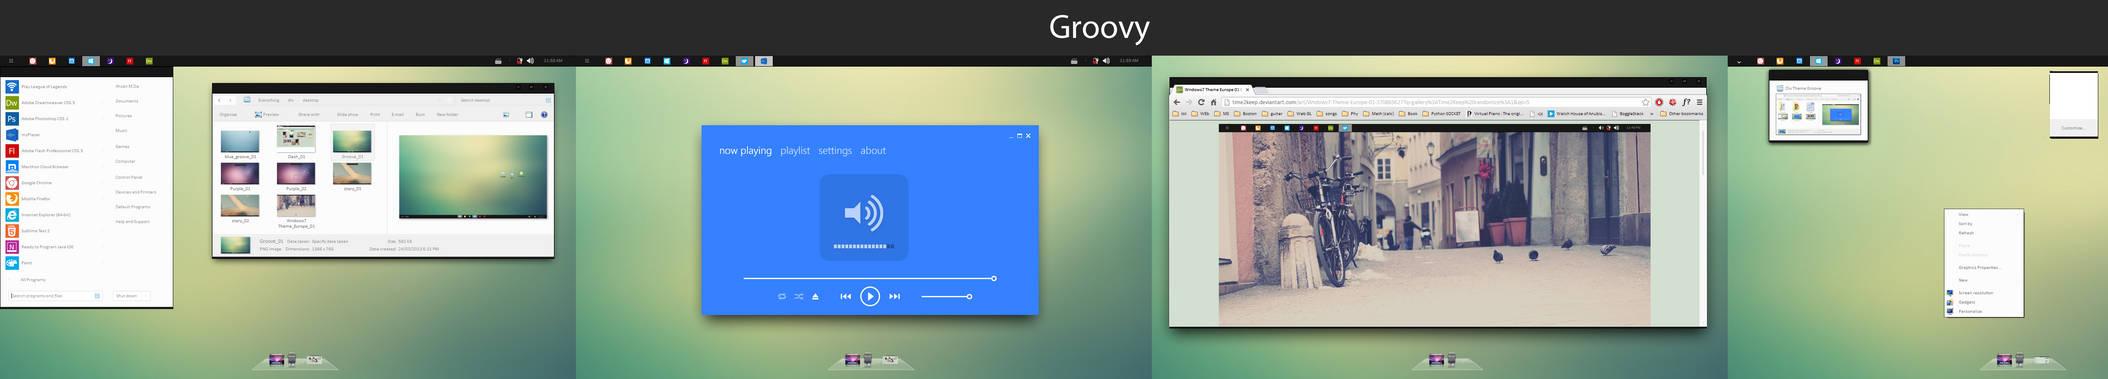 Windows 7 Groovy Theme